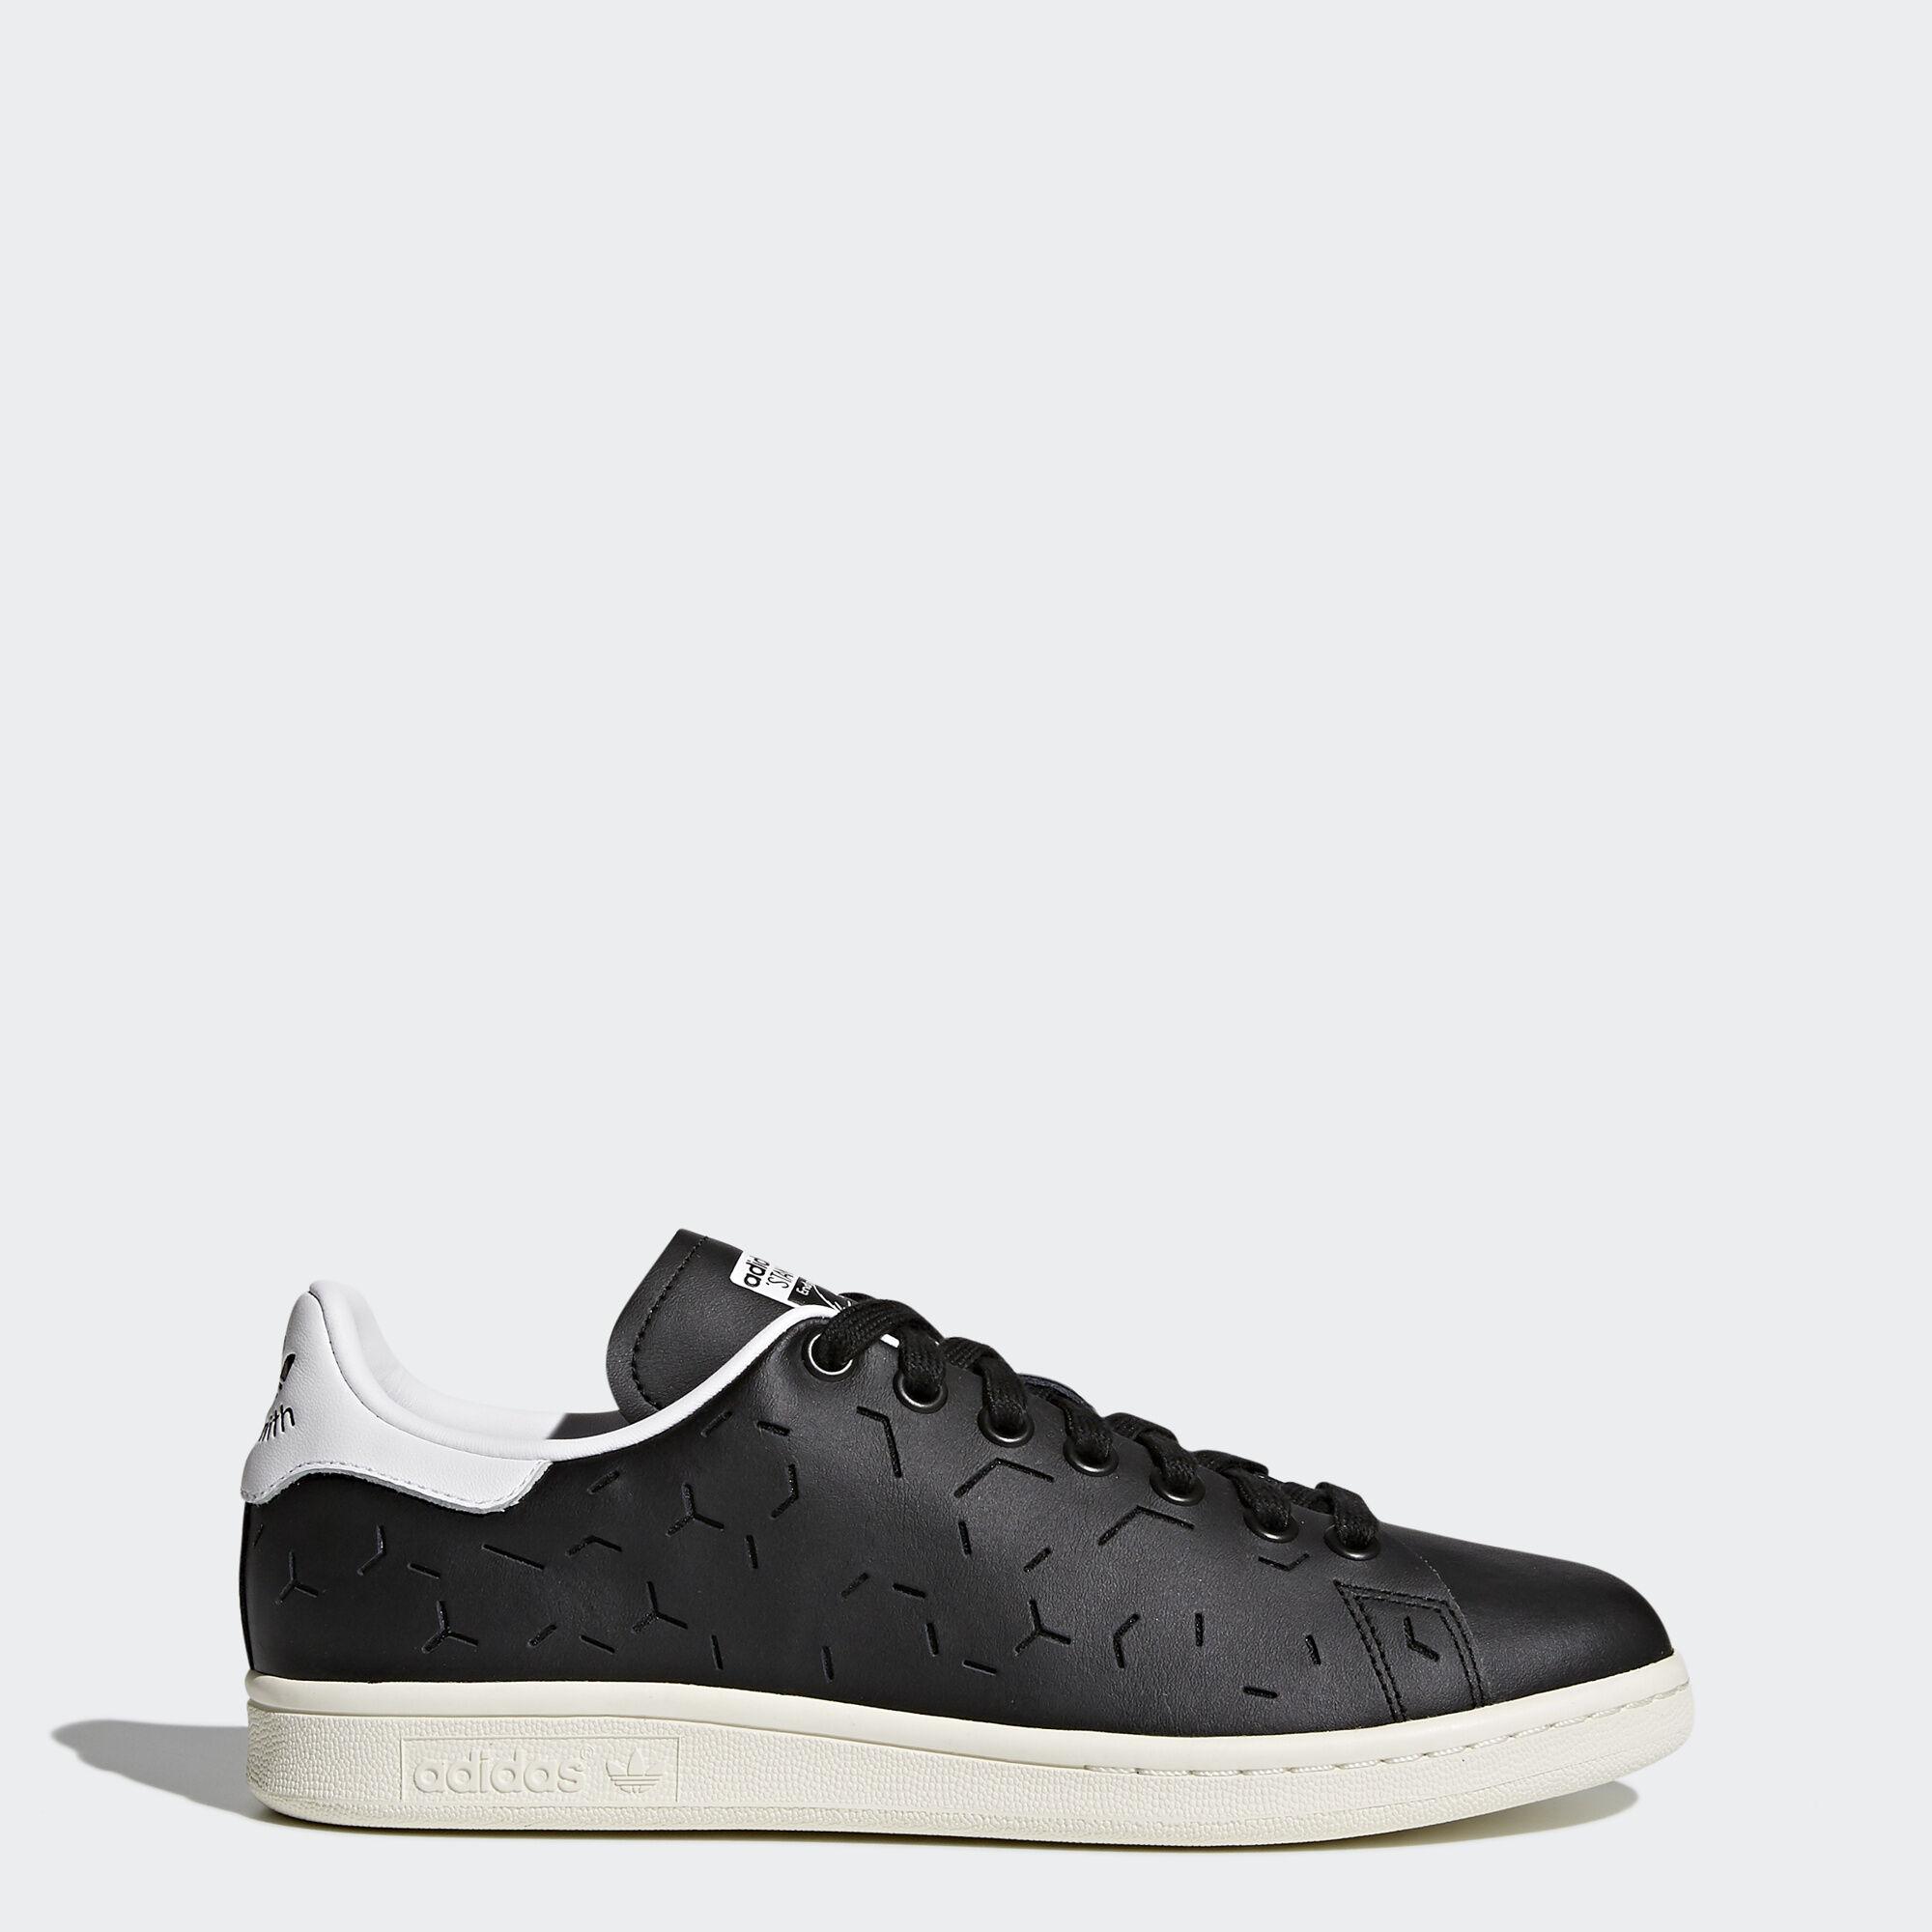 adidas - Stan Smith Shoes Core Black/Footwear White BZ0394